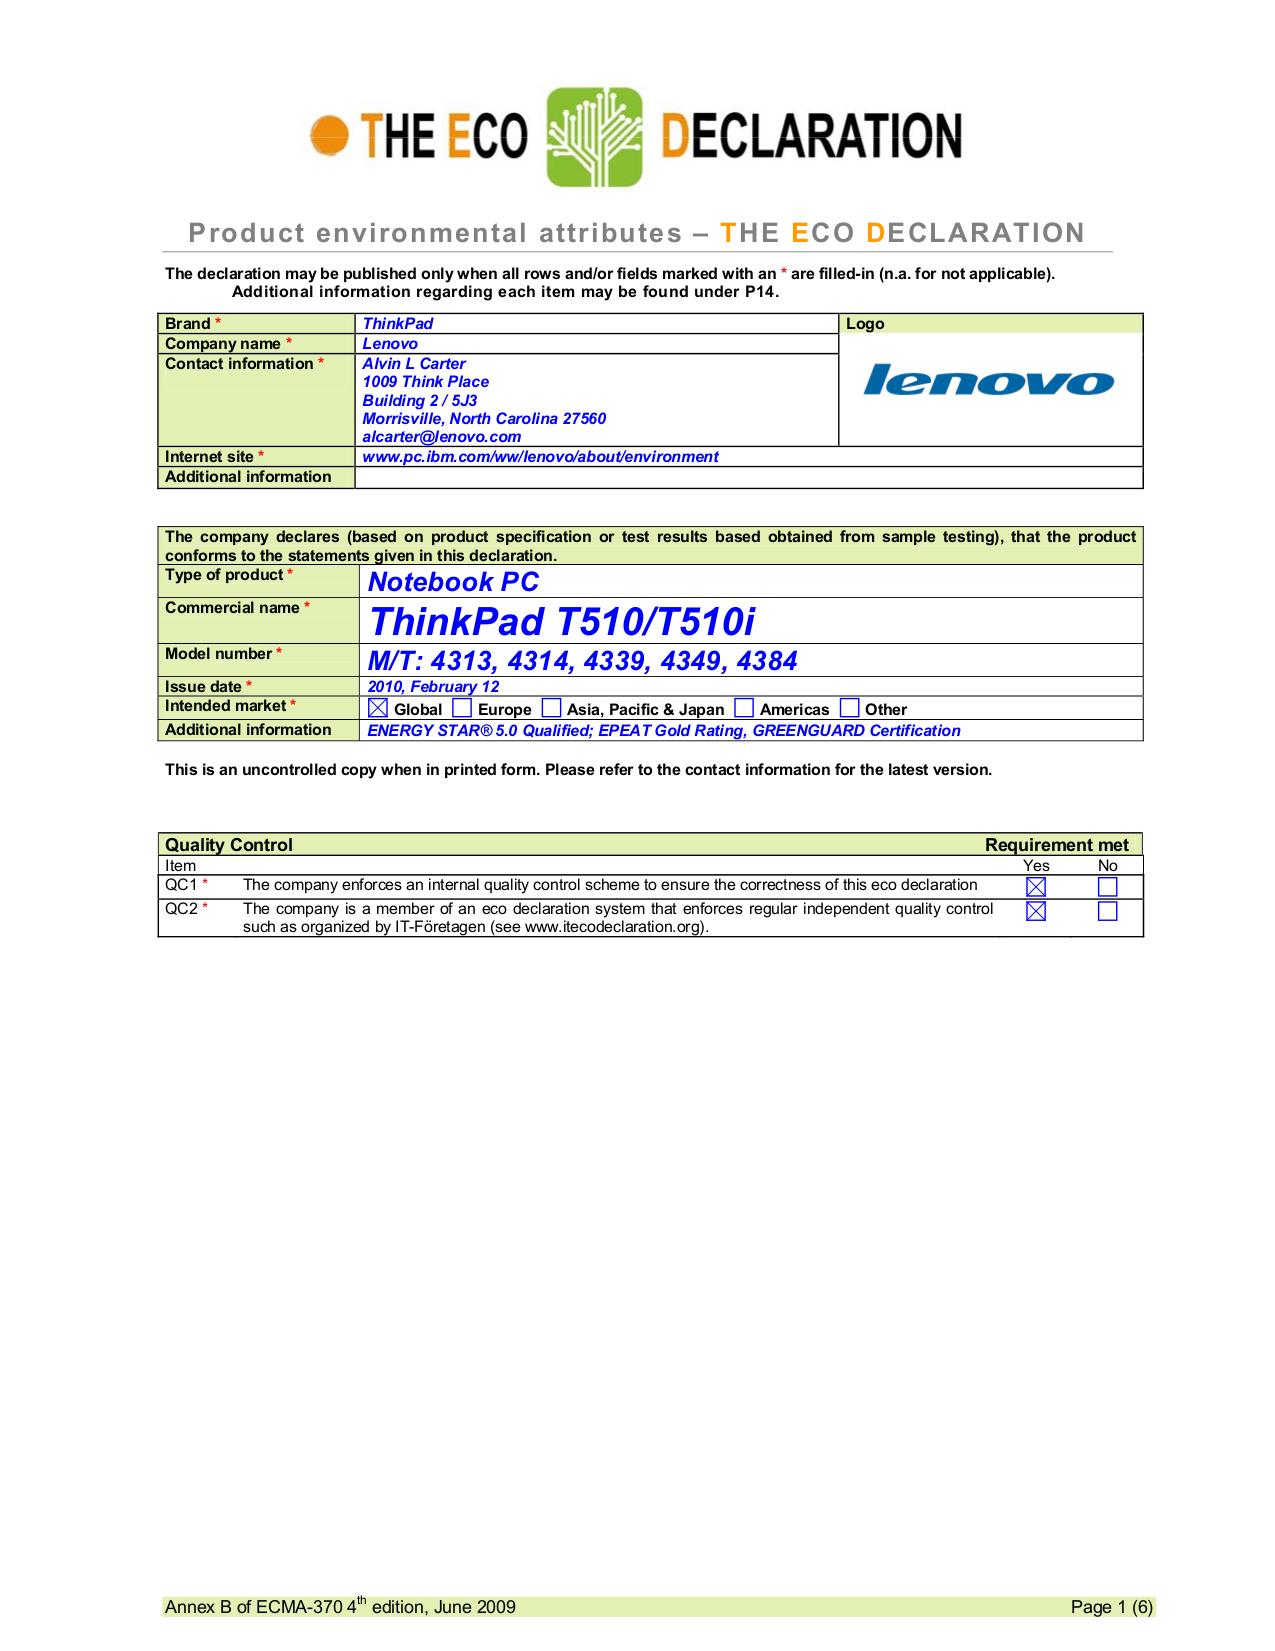 pdf for Lenovo Laptop ThinkPad T510 4384 manual